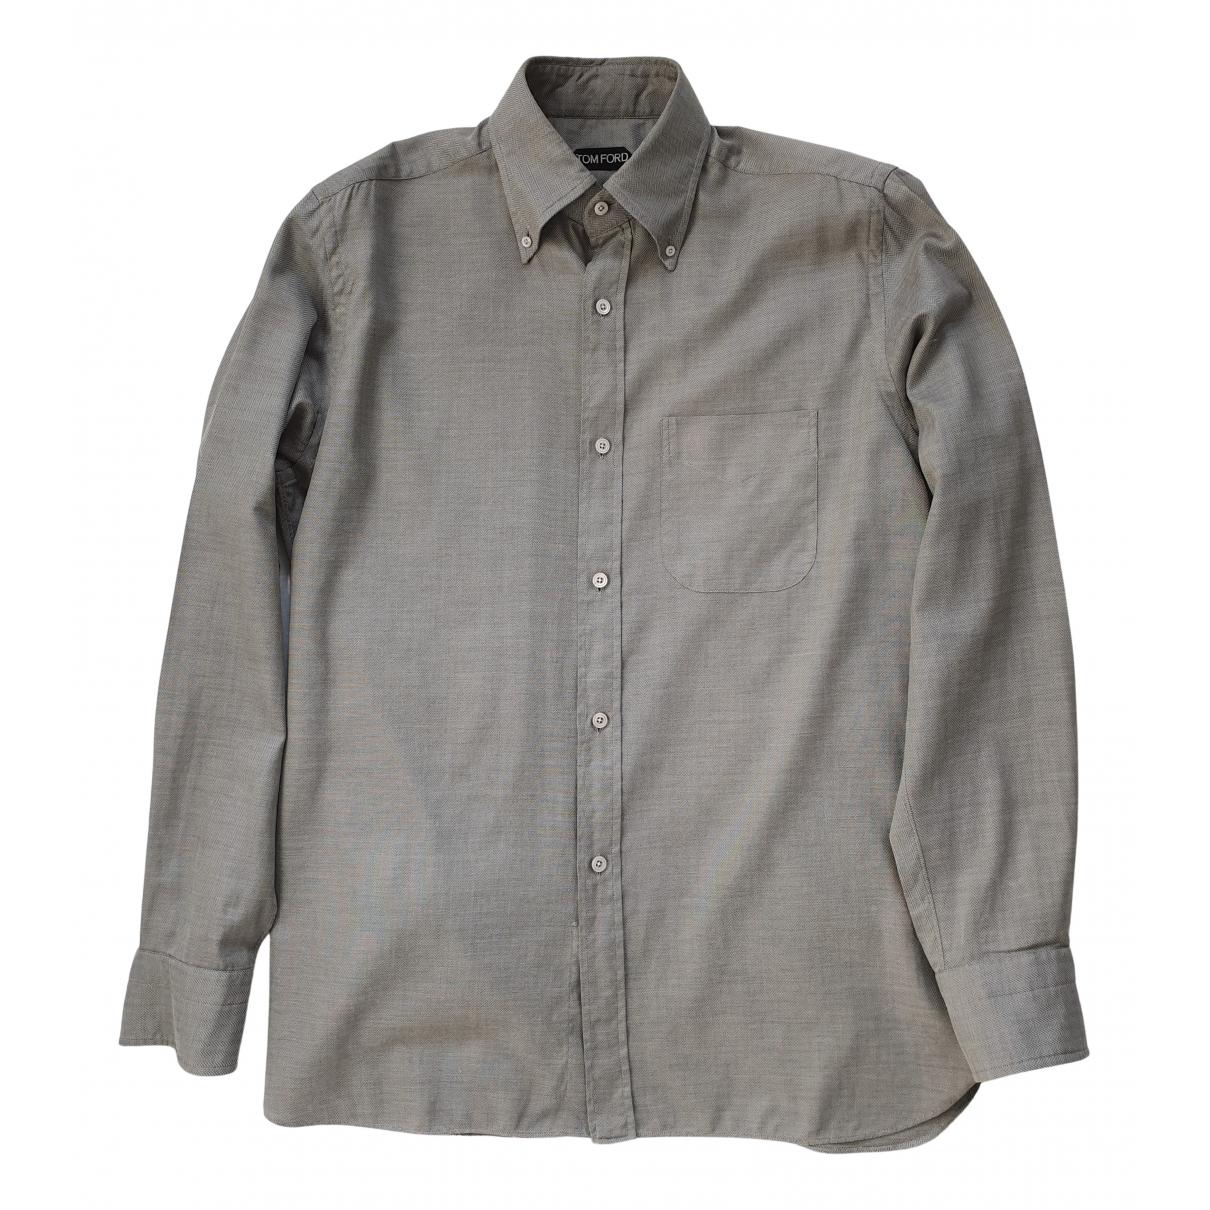 Tom Ford \N Grey Cotton Shirts for Men 40 EU (tour de cou / collar)